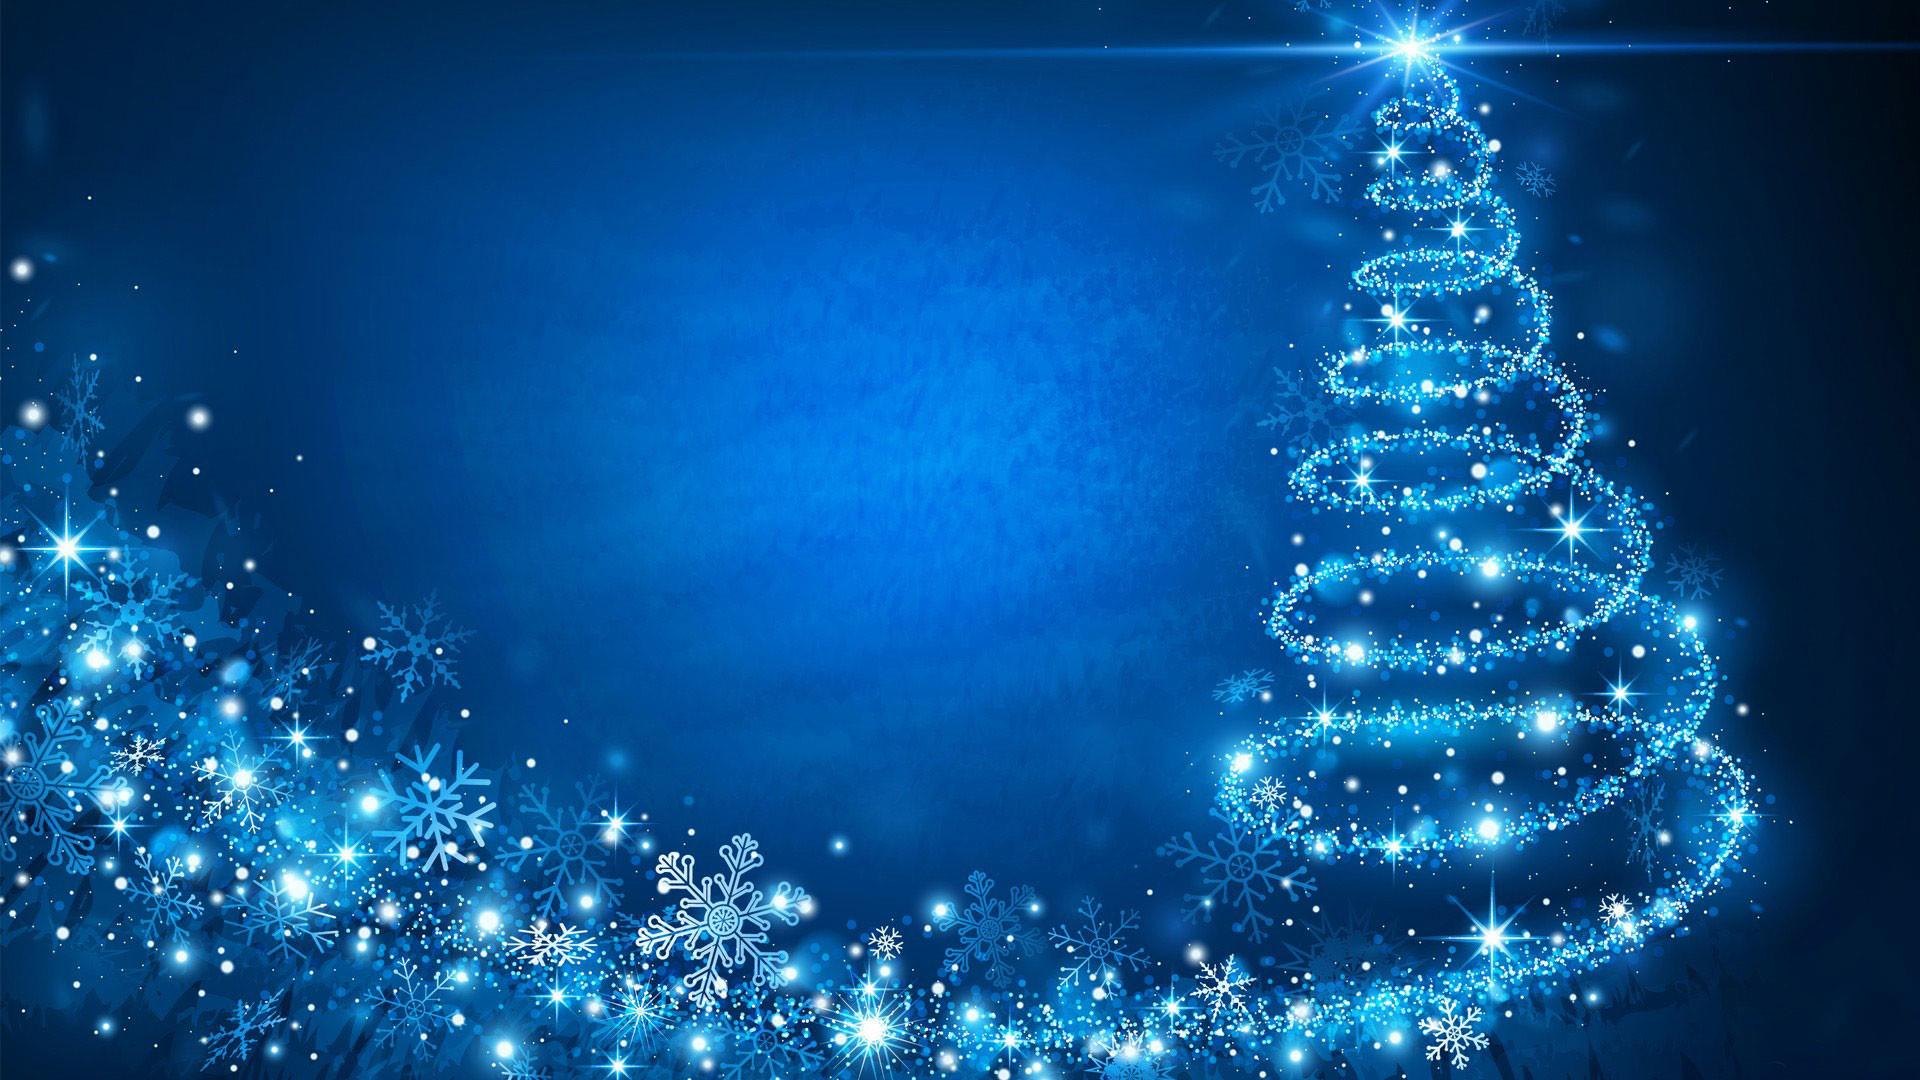 hd pics photos christmas blue christmas desktop background wallpaper